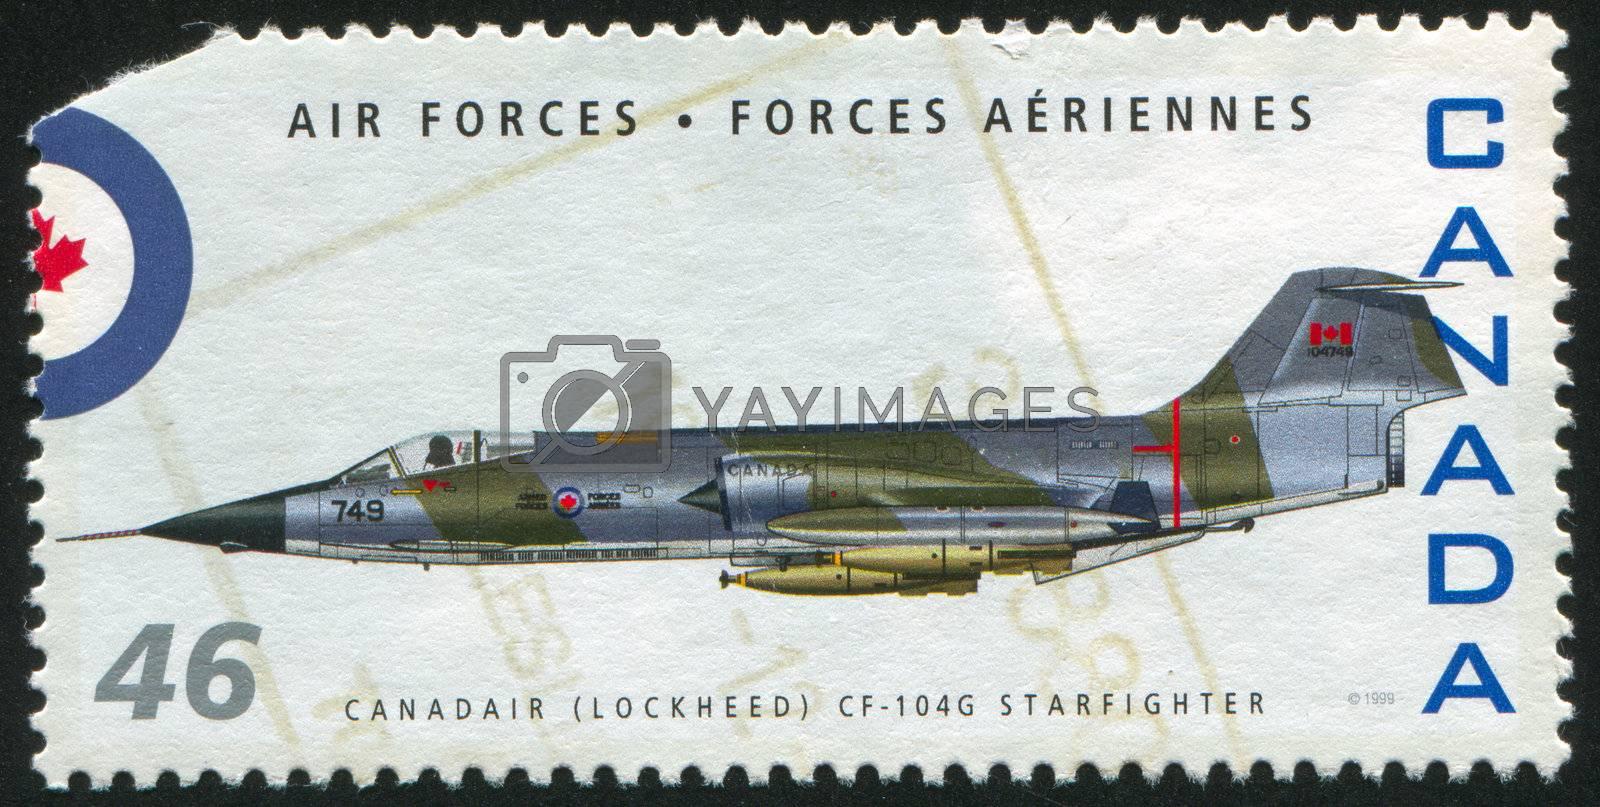 CANADA - CIRCA 1999: stamp printed by Canada, shows aeroplane, Canadair (Lockheed) CF-104G Starfighter, circa 1999